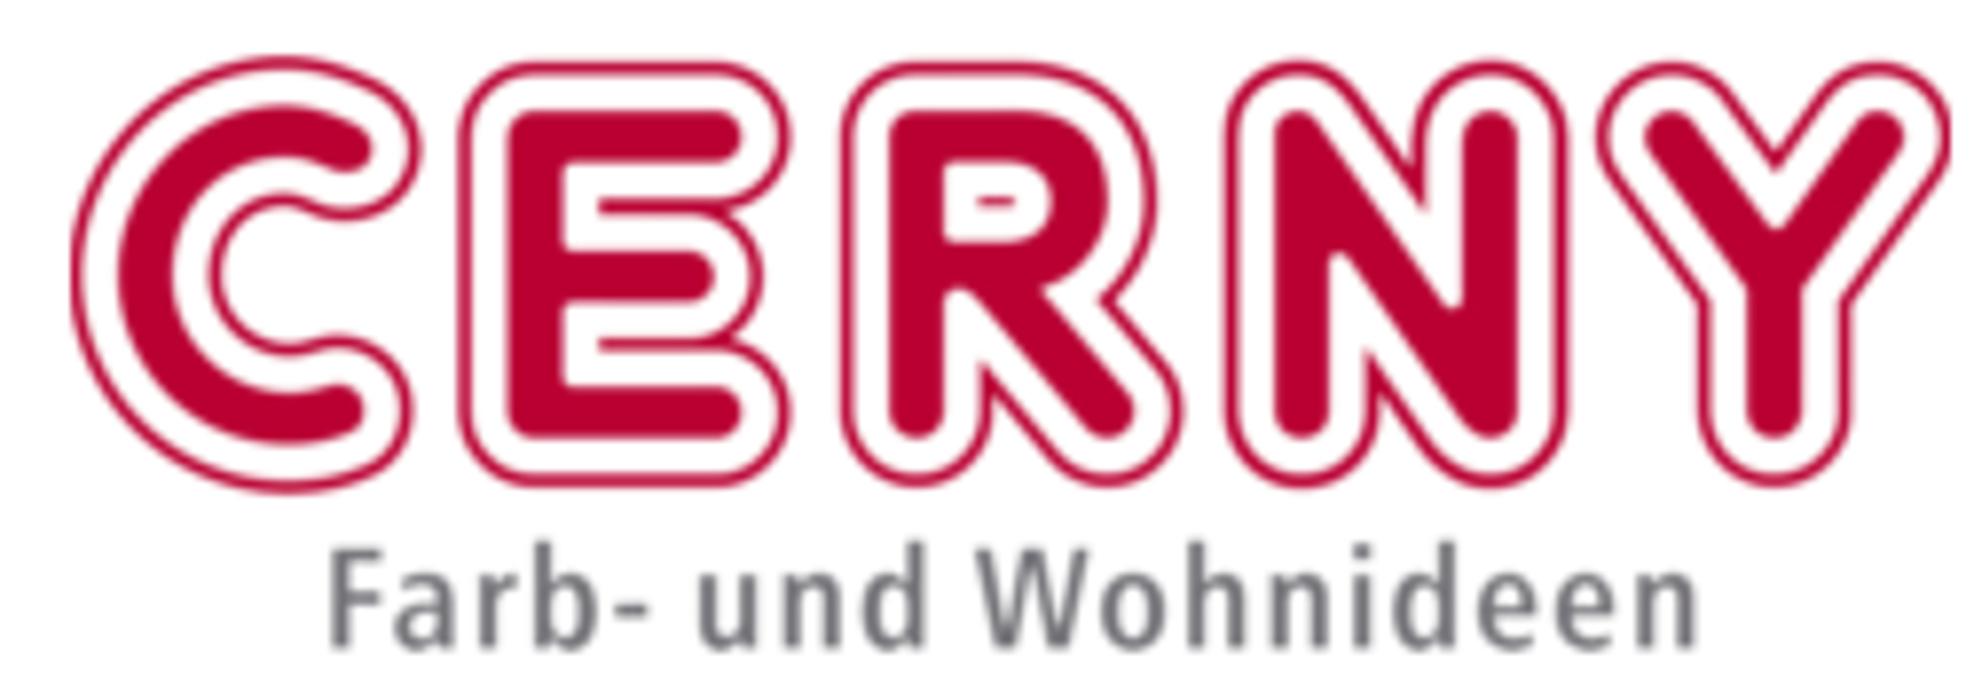 Farben Neuendettelsau (91564) - YellowMap